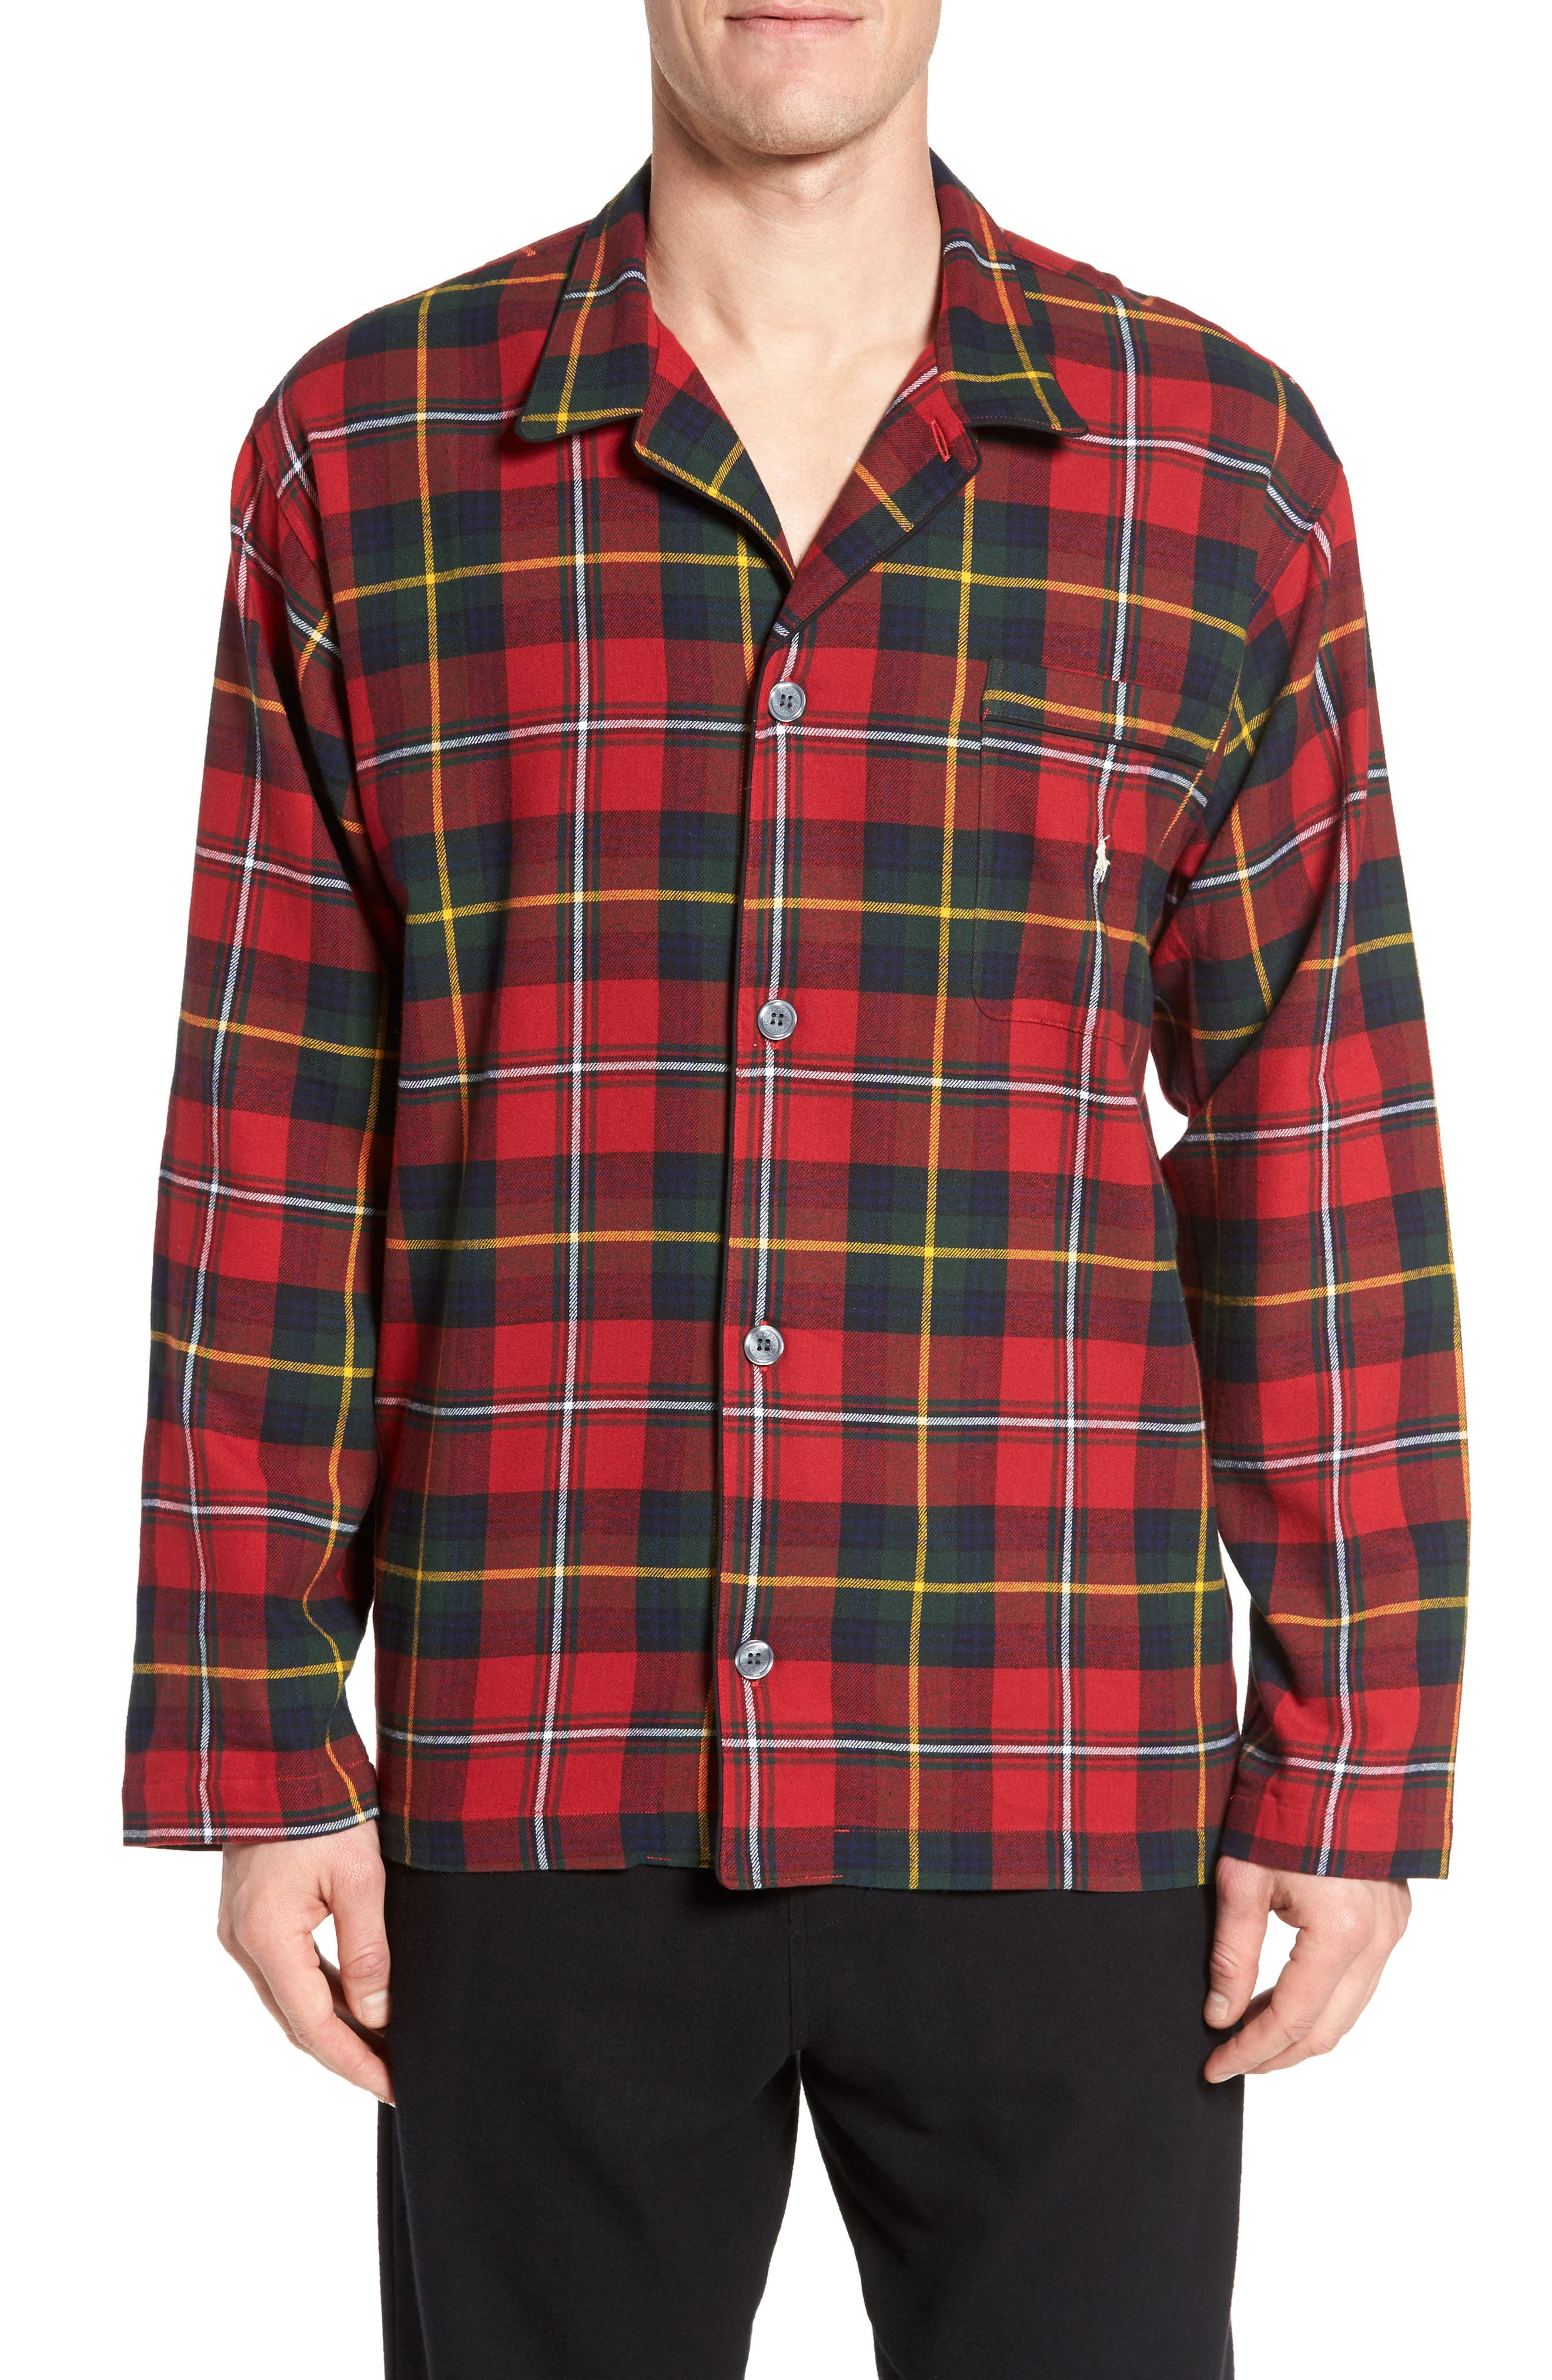 Polo Ralph Lauren Flannel Pajama Shirt,                             Main thumbnail 1, color,                             Andrew Plaid/ Black/ Cream